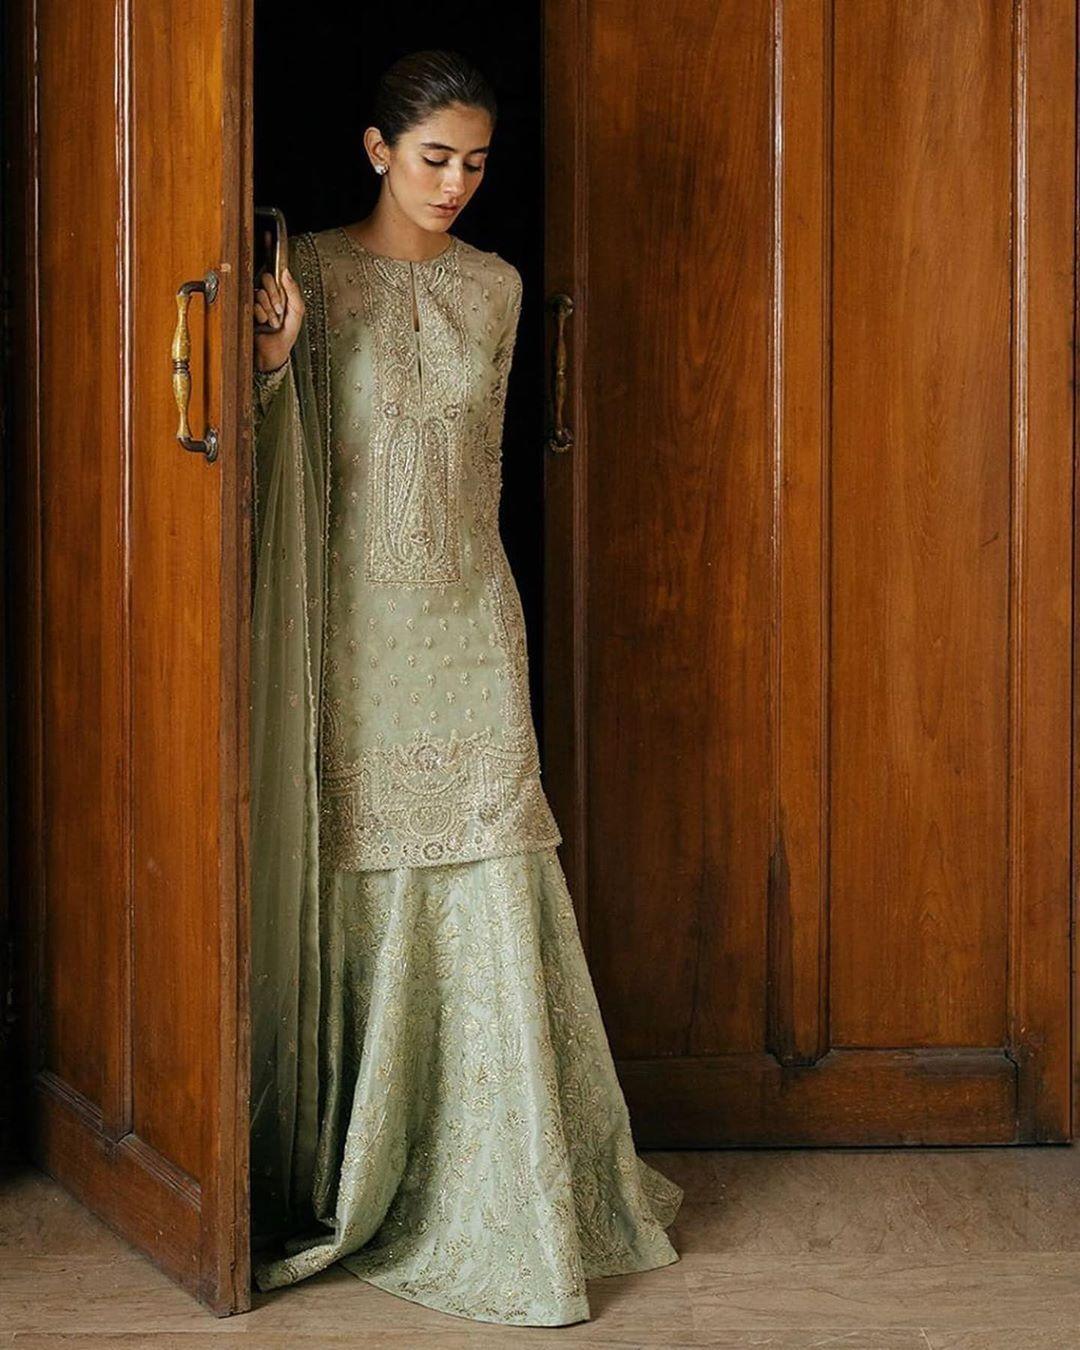 "ReynaSays - Fashion Enthusiast on Instagram: ""Syra Yousaf is the true natural beauty! ⚡🌟 . . . . . . . . . . . . . . . .  #fashionweek #fashionworld #fashionblogger #fashionbombdaily…"""